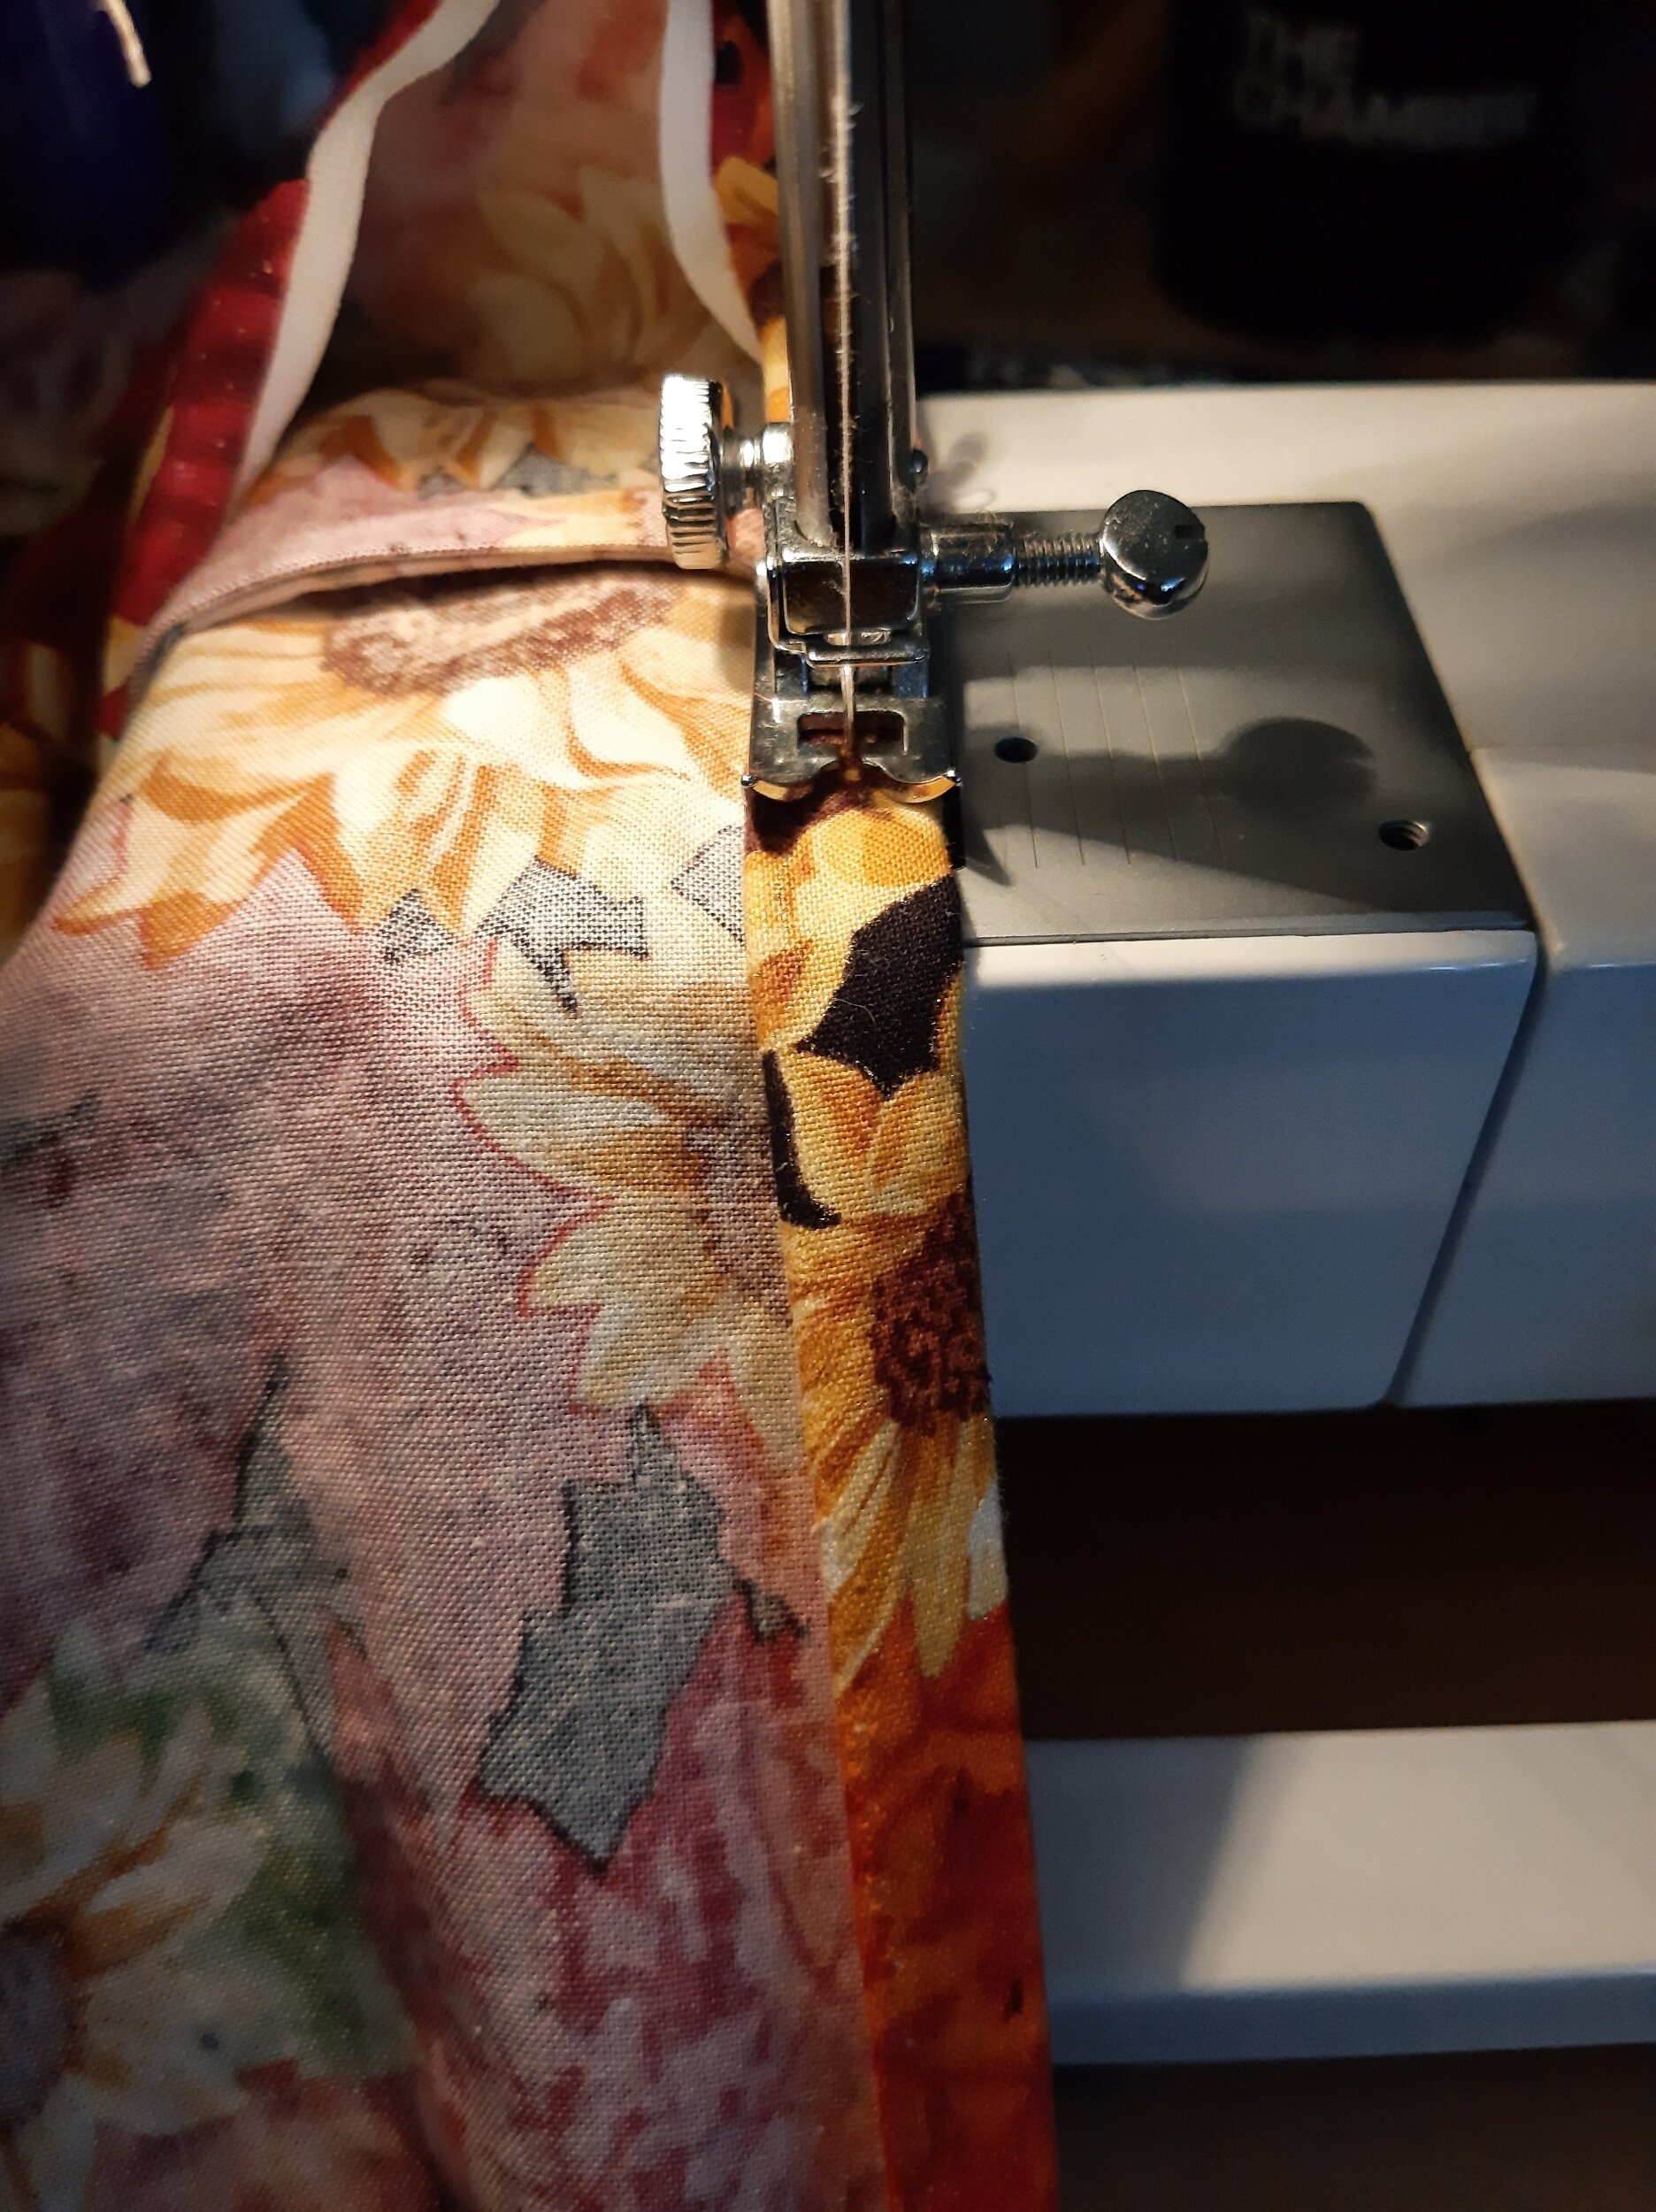 Sewing the hem.